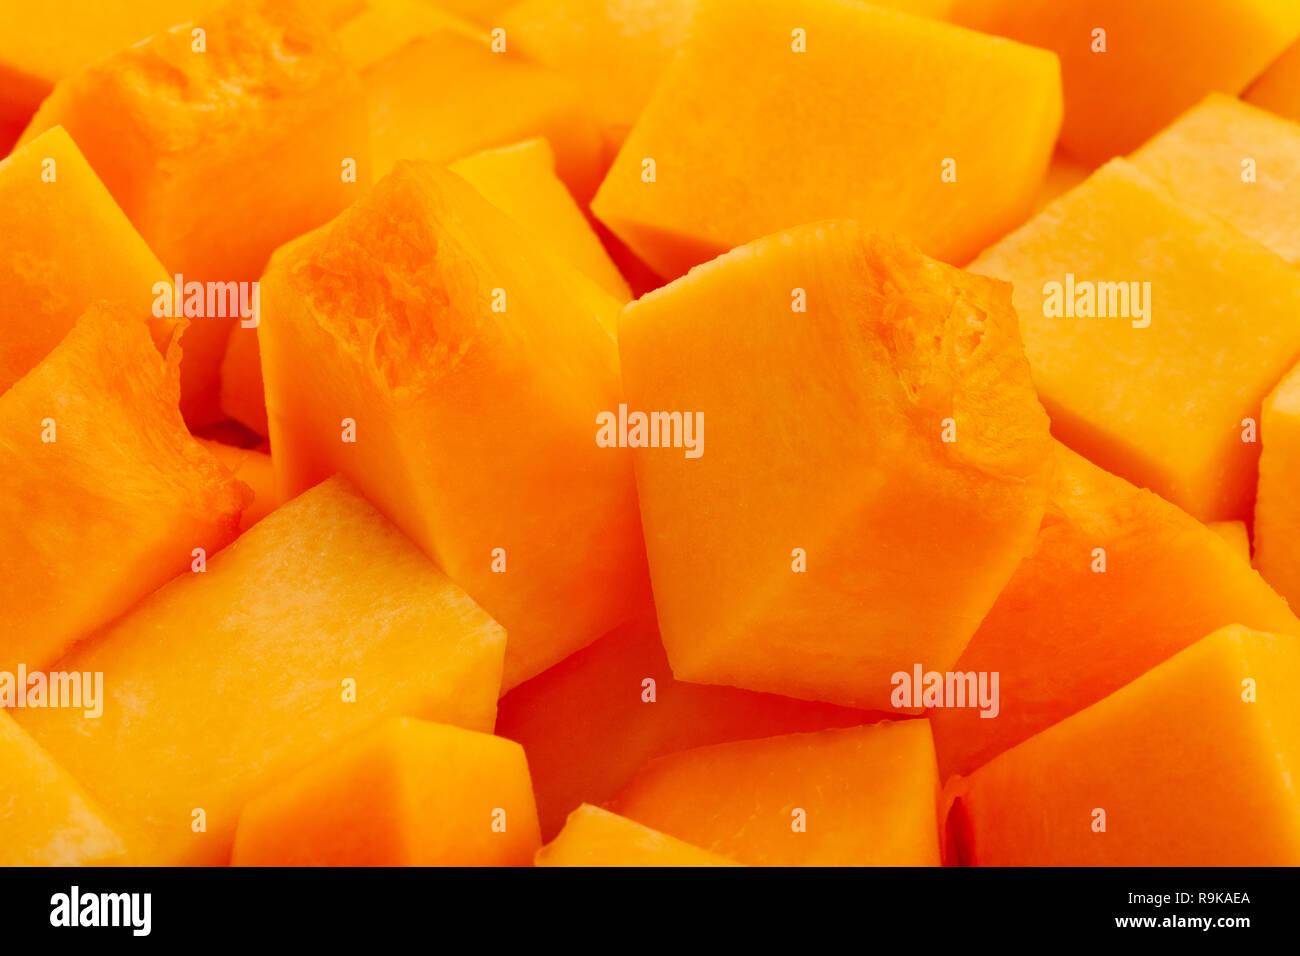 Rodajas de calabacita macro closeup Imagen De Stock